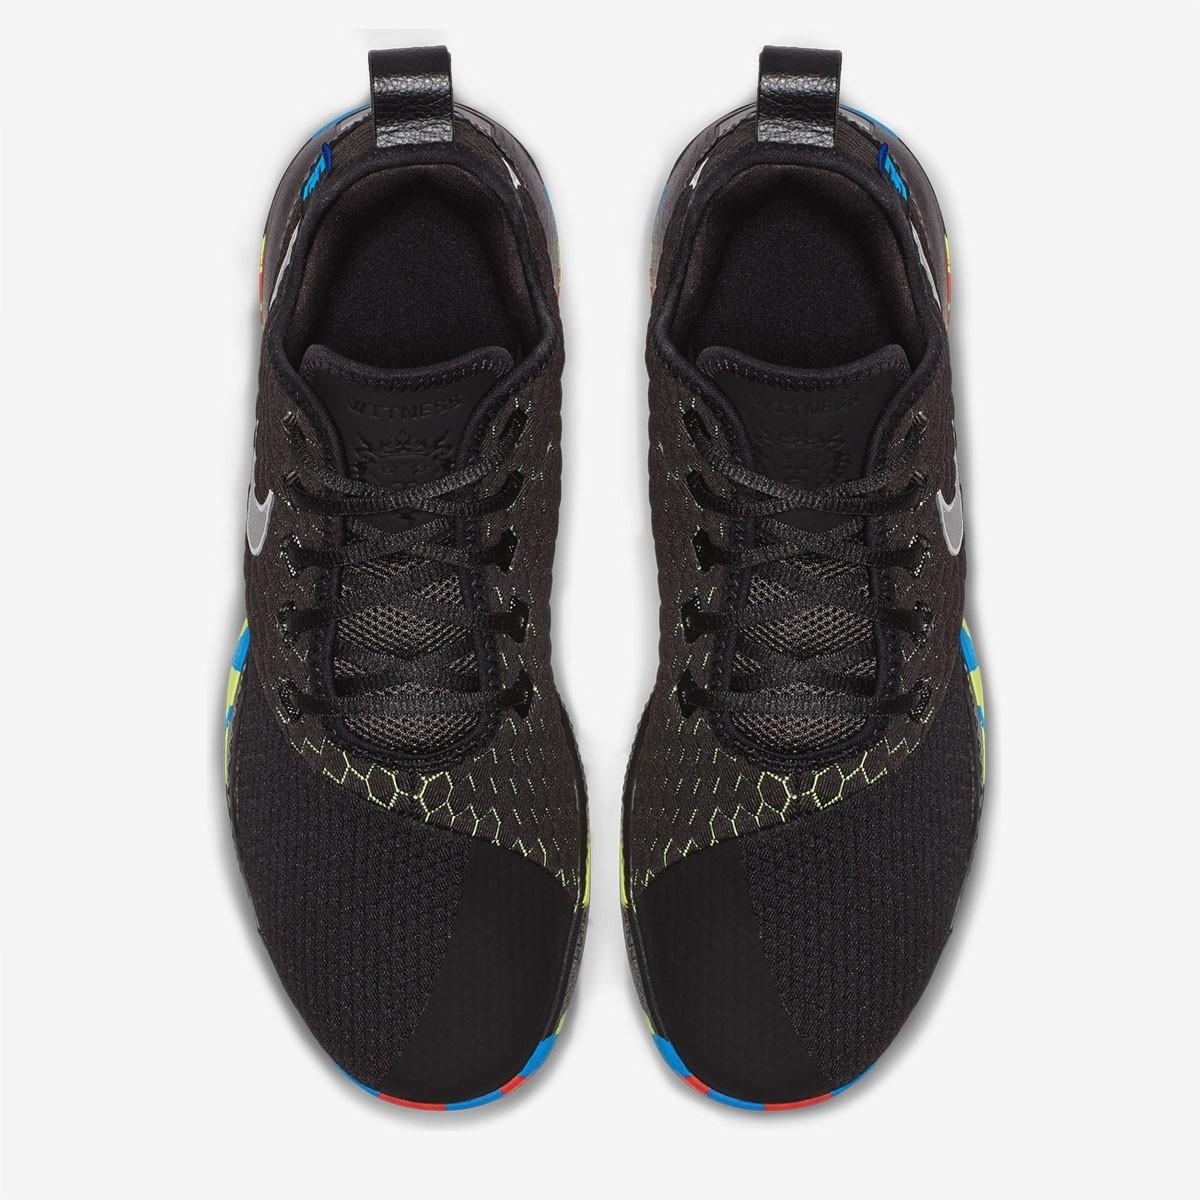 Nike Lebron Witness III GS 'I Promise' AO4433-009-Jr